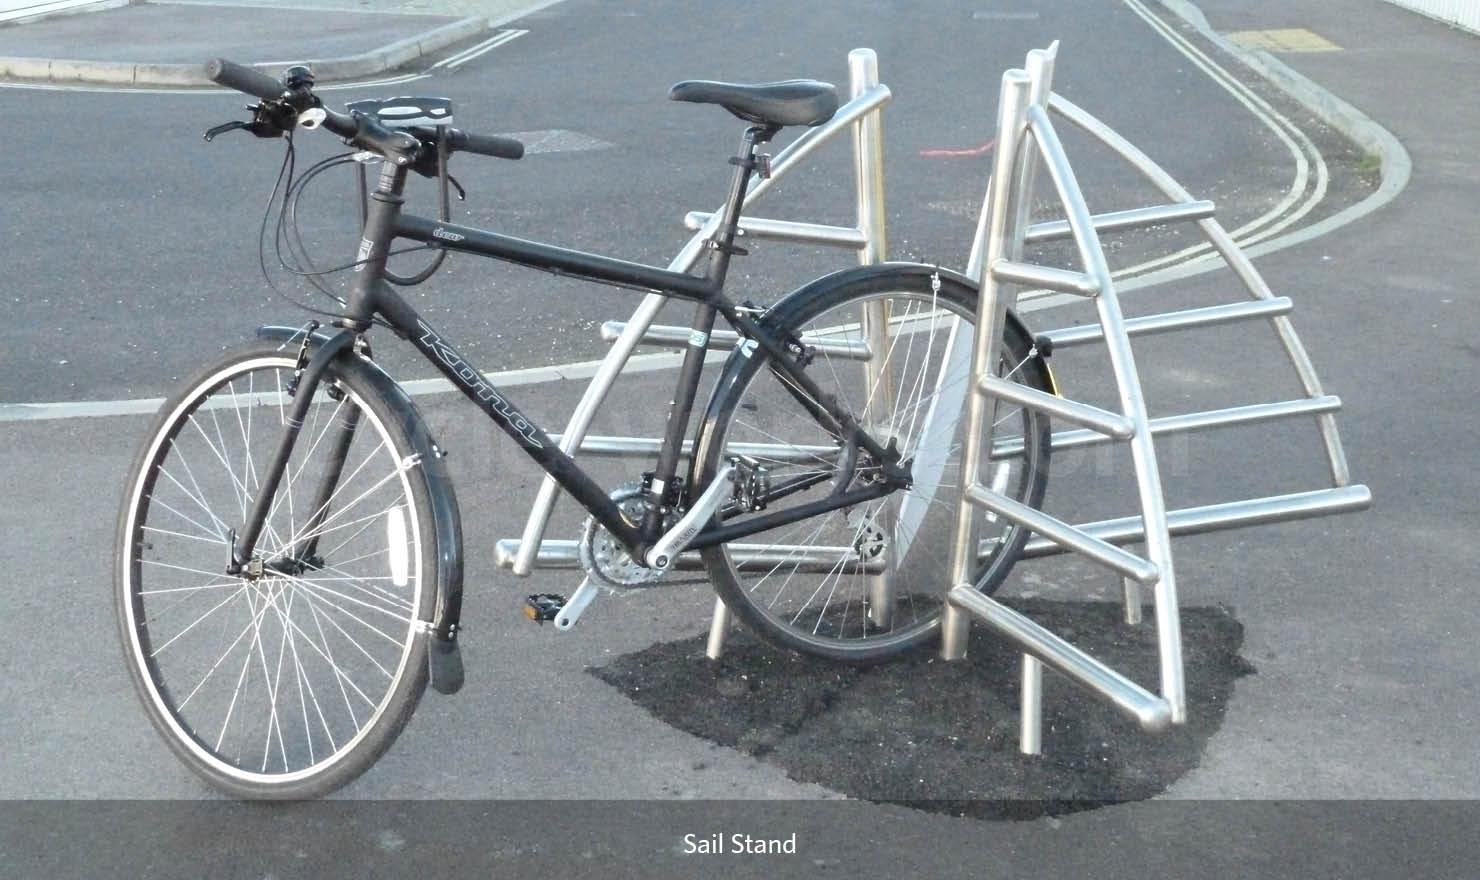 Sail Bike Rack